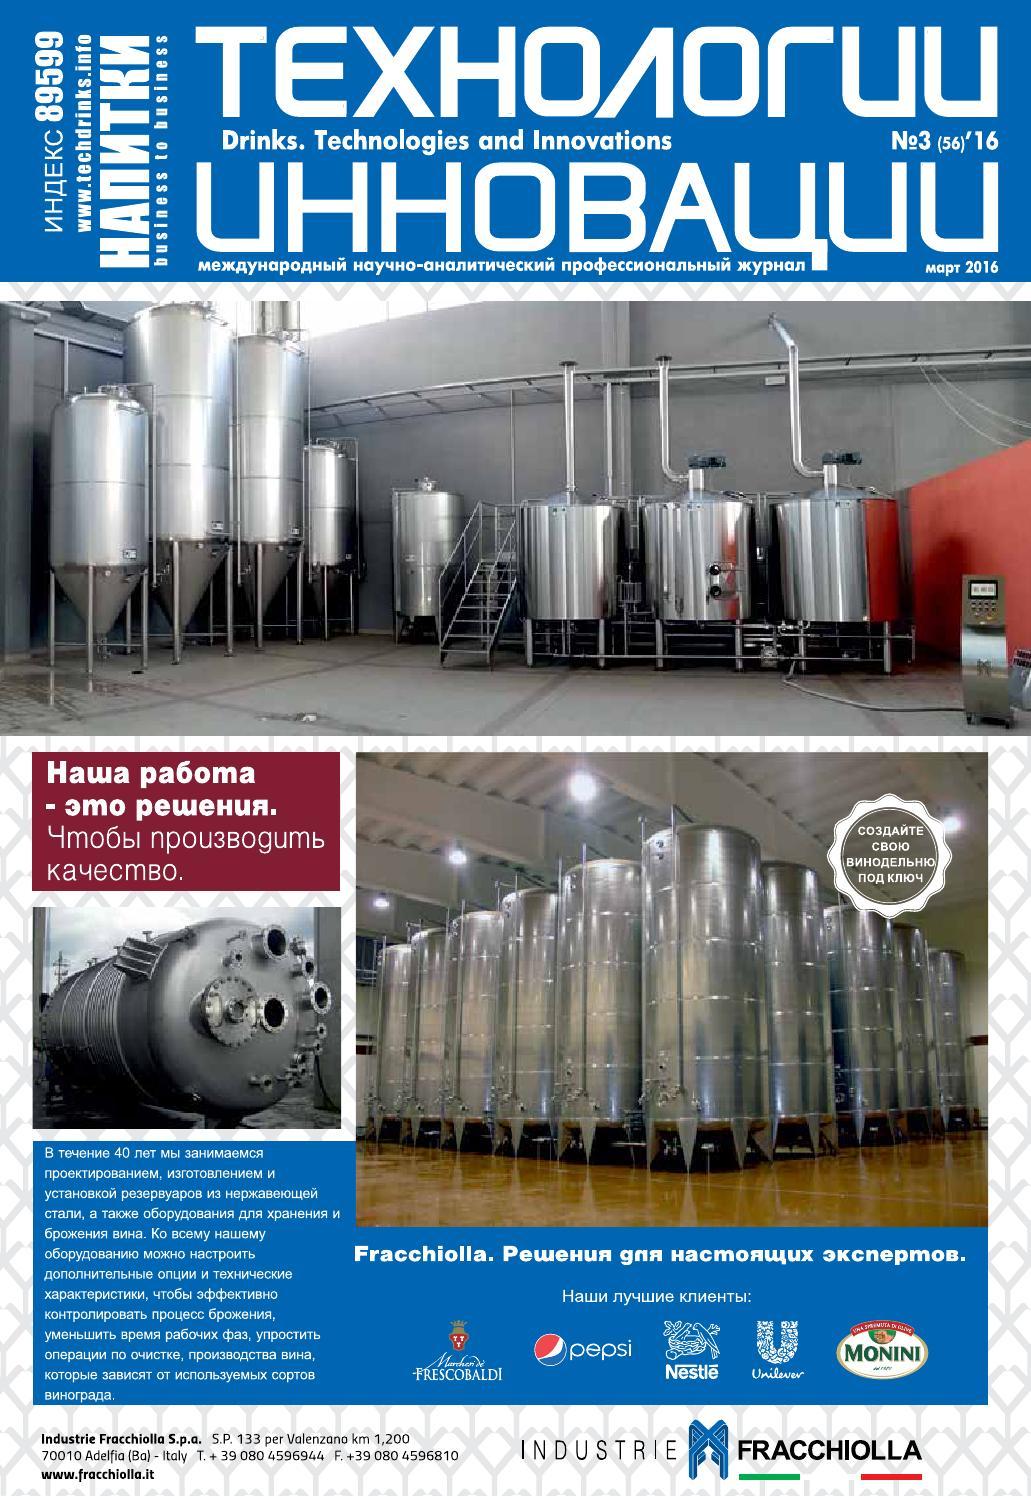 a8bc49cc9b37 №3 (2016) Напитки. Технологии и Инновации by Drinks Gallery - issuu